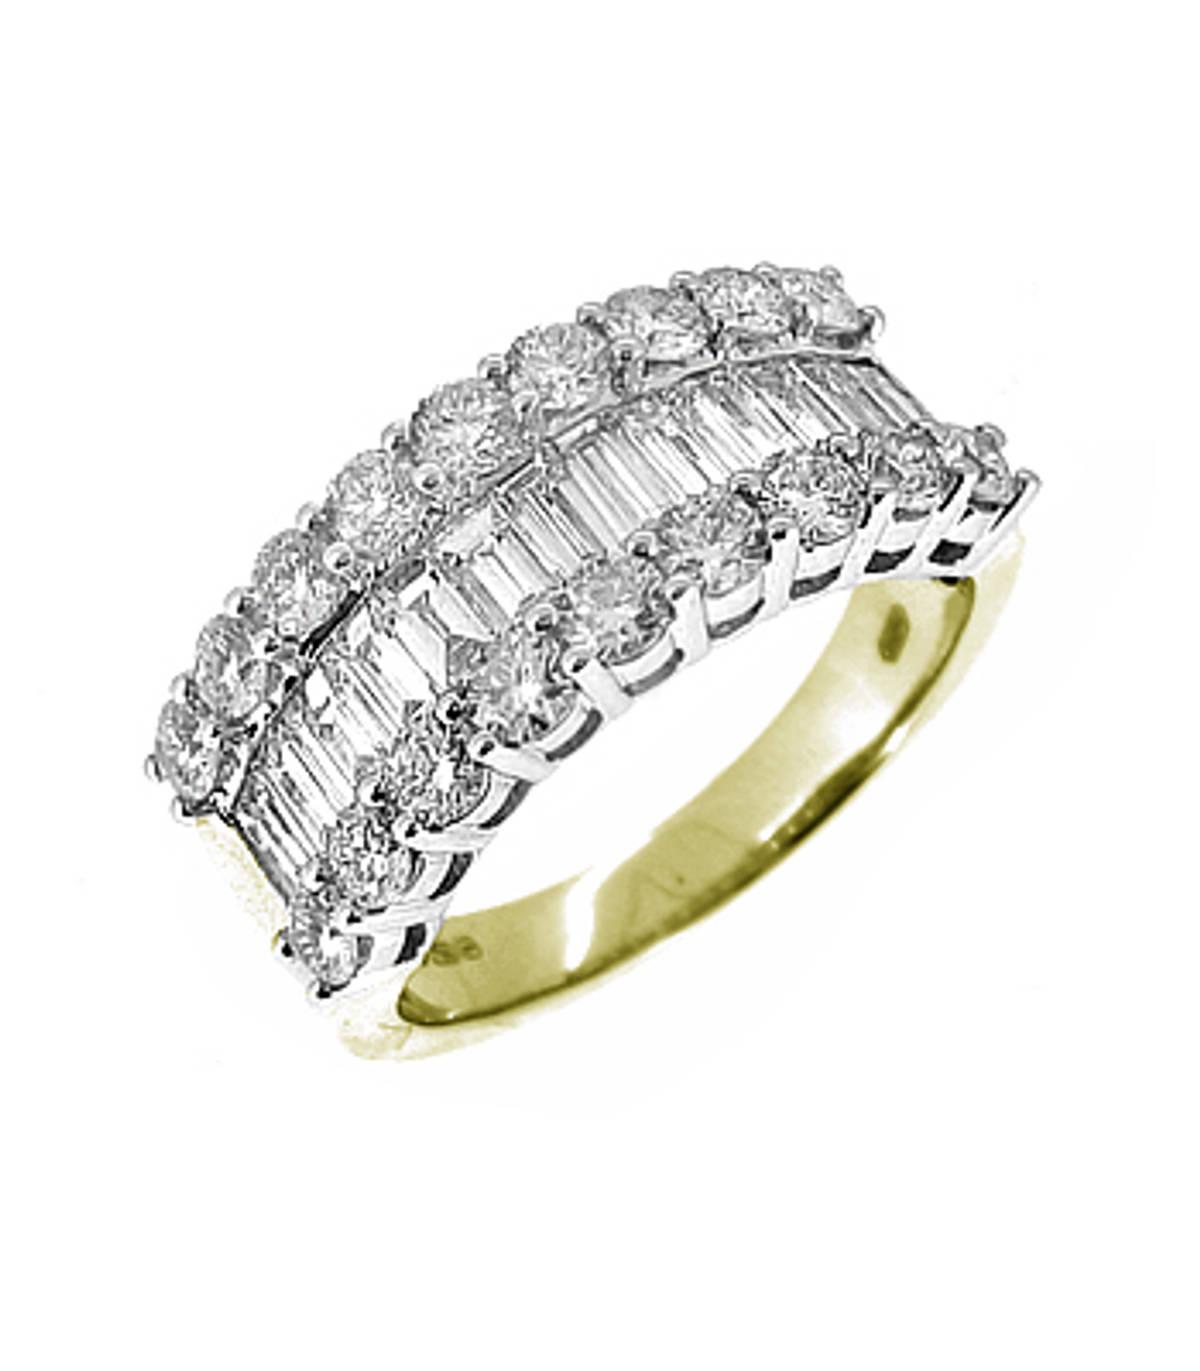 3 ROW DIAMOND DRESS RING 18k yellow and white gold baguette & brilliant cut diamond 3 row dress ringDETAILSCarat: diamond total weight 2.13ctsCut: Brilliant cut and BaguetteMetal: 18k yellow and white gold